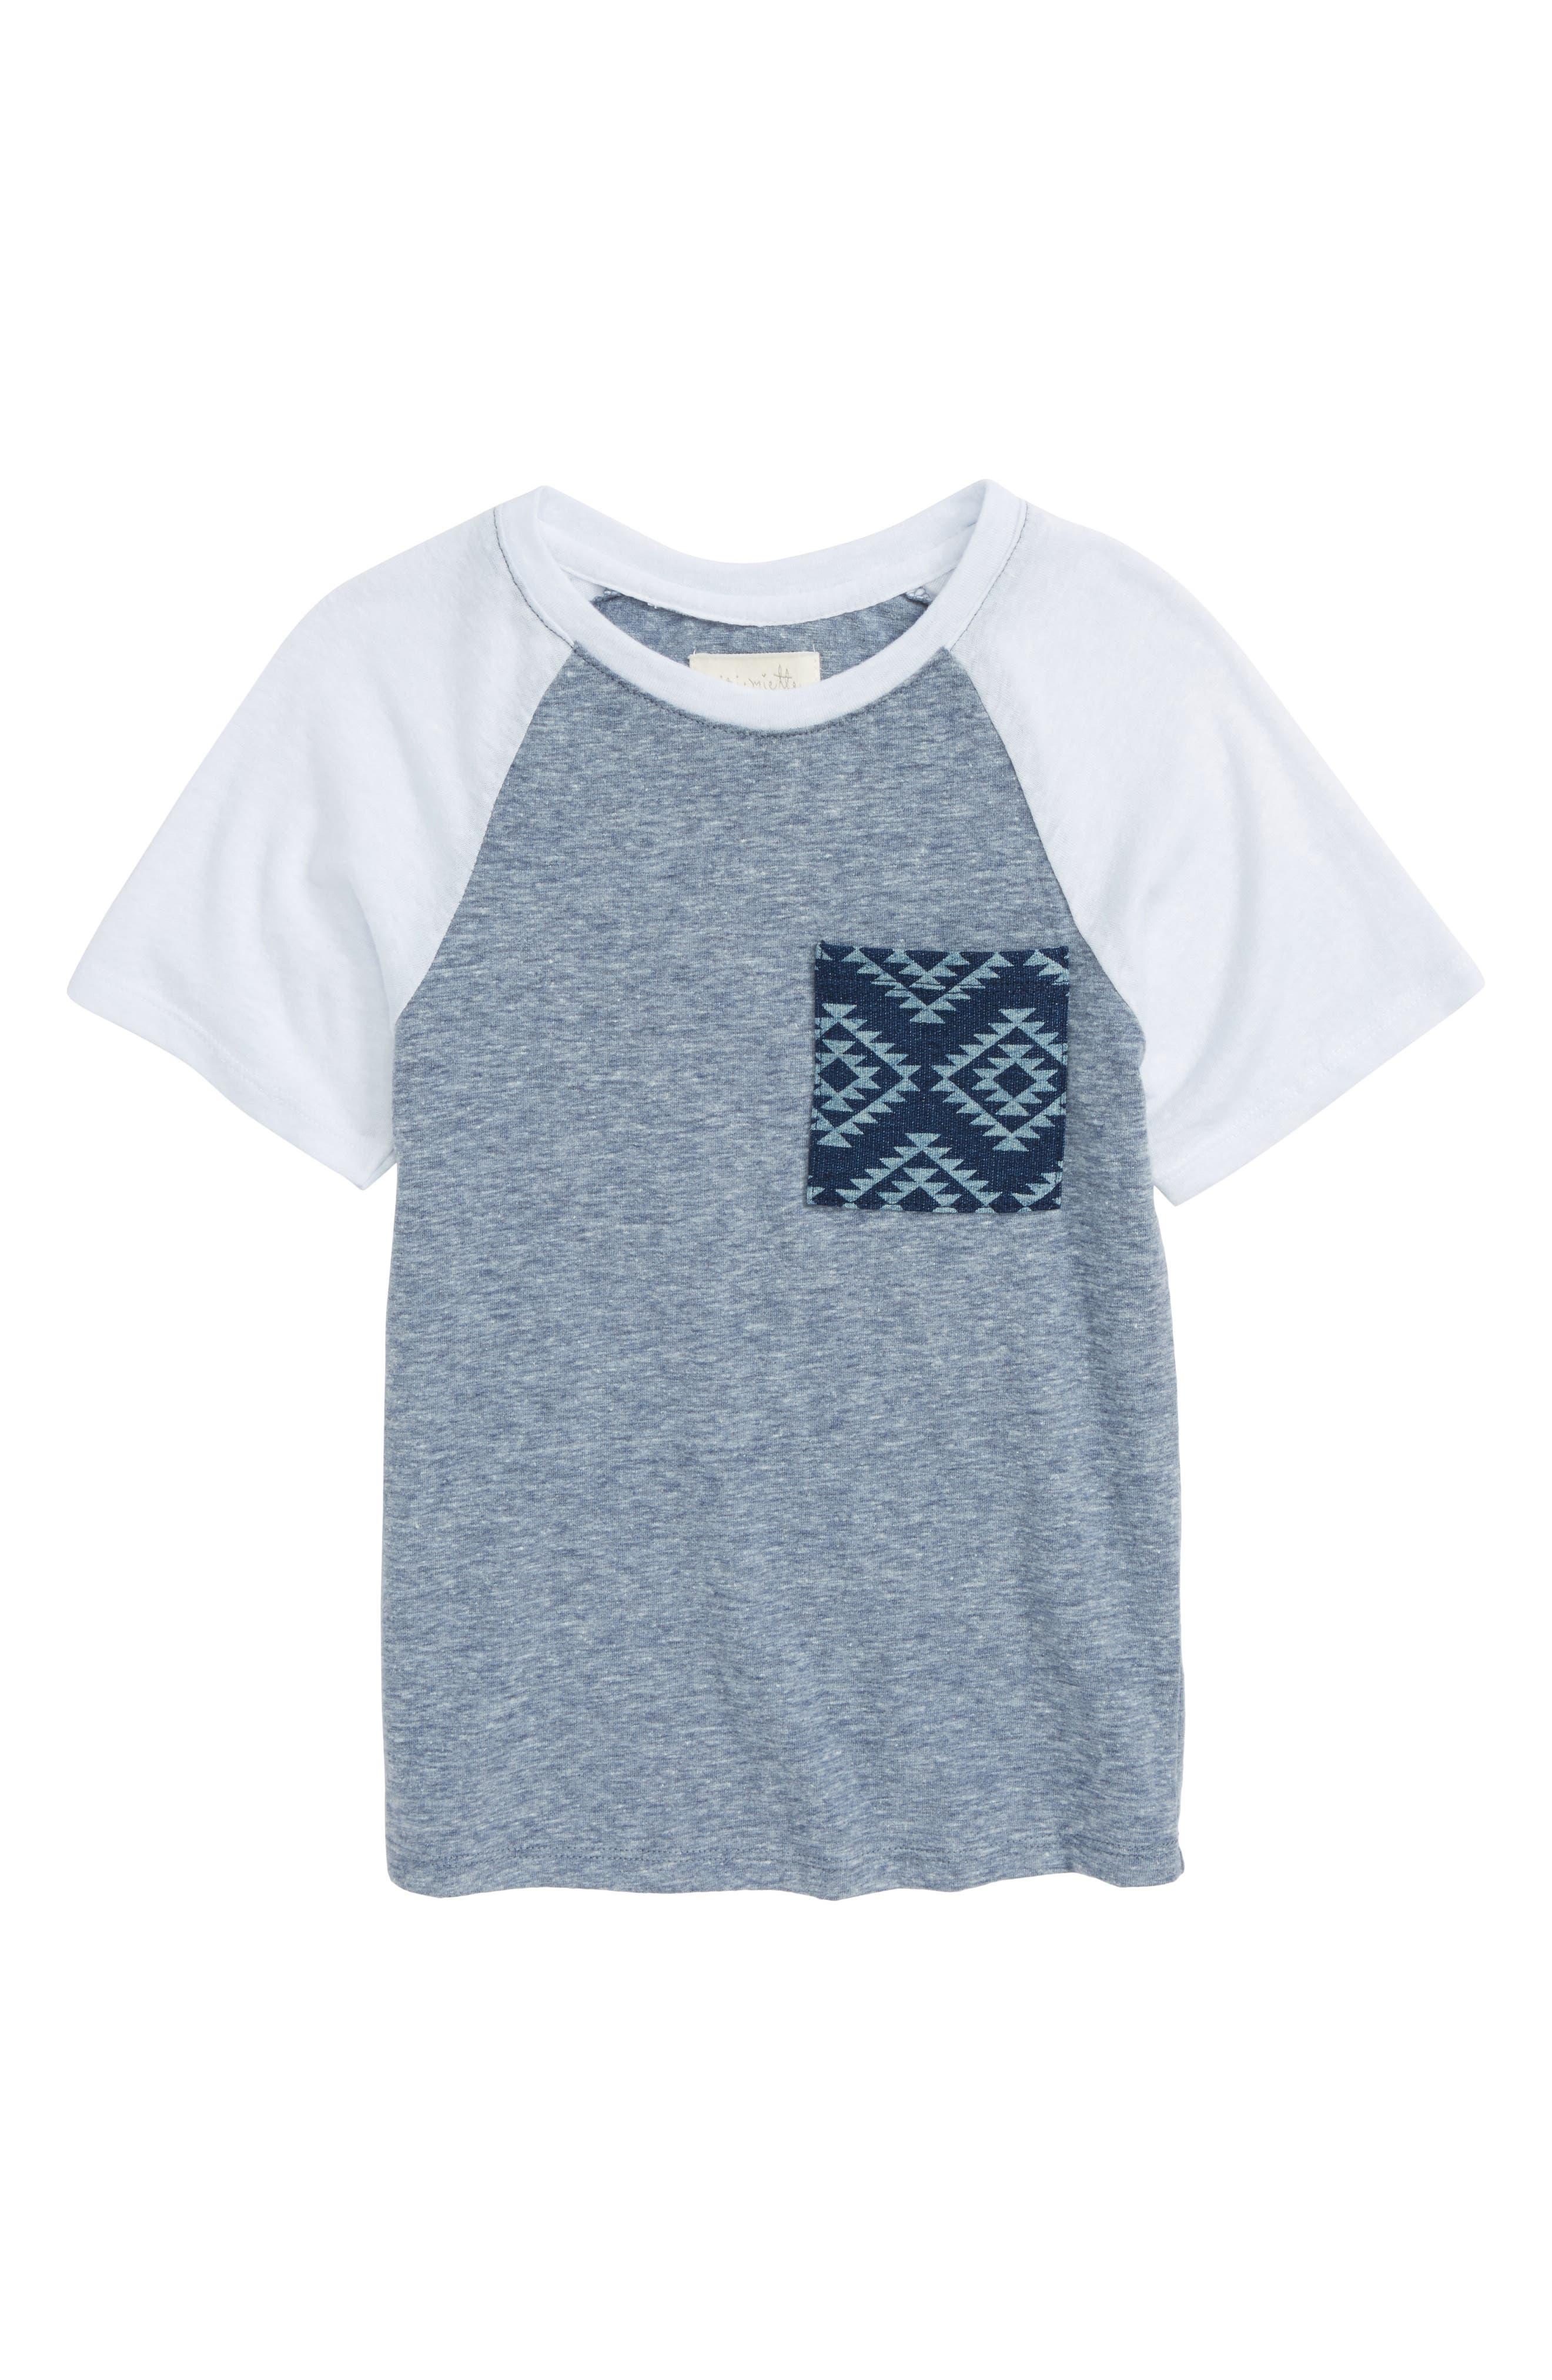 Sydney Pocket T-Shirt,                         Main,                         color, Yuma